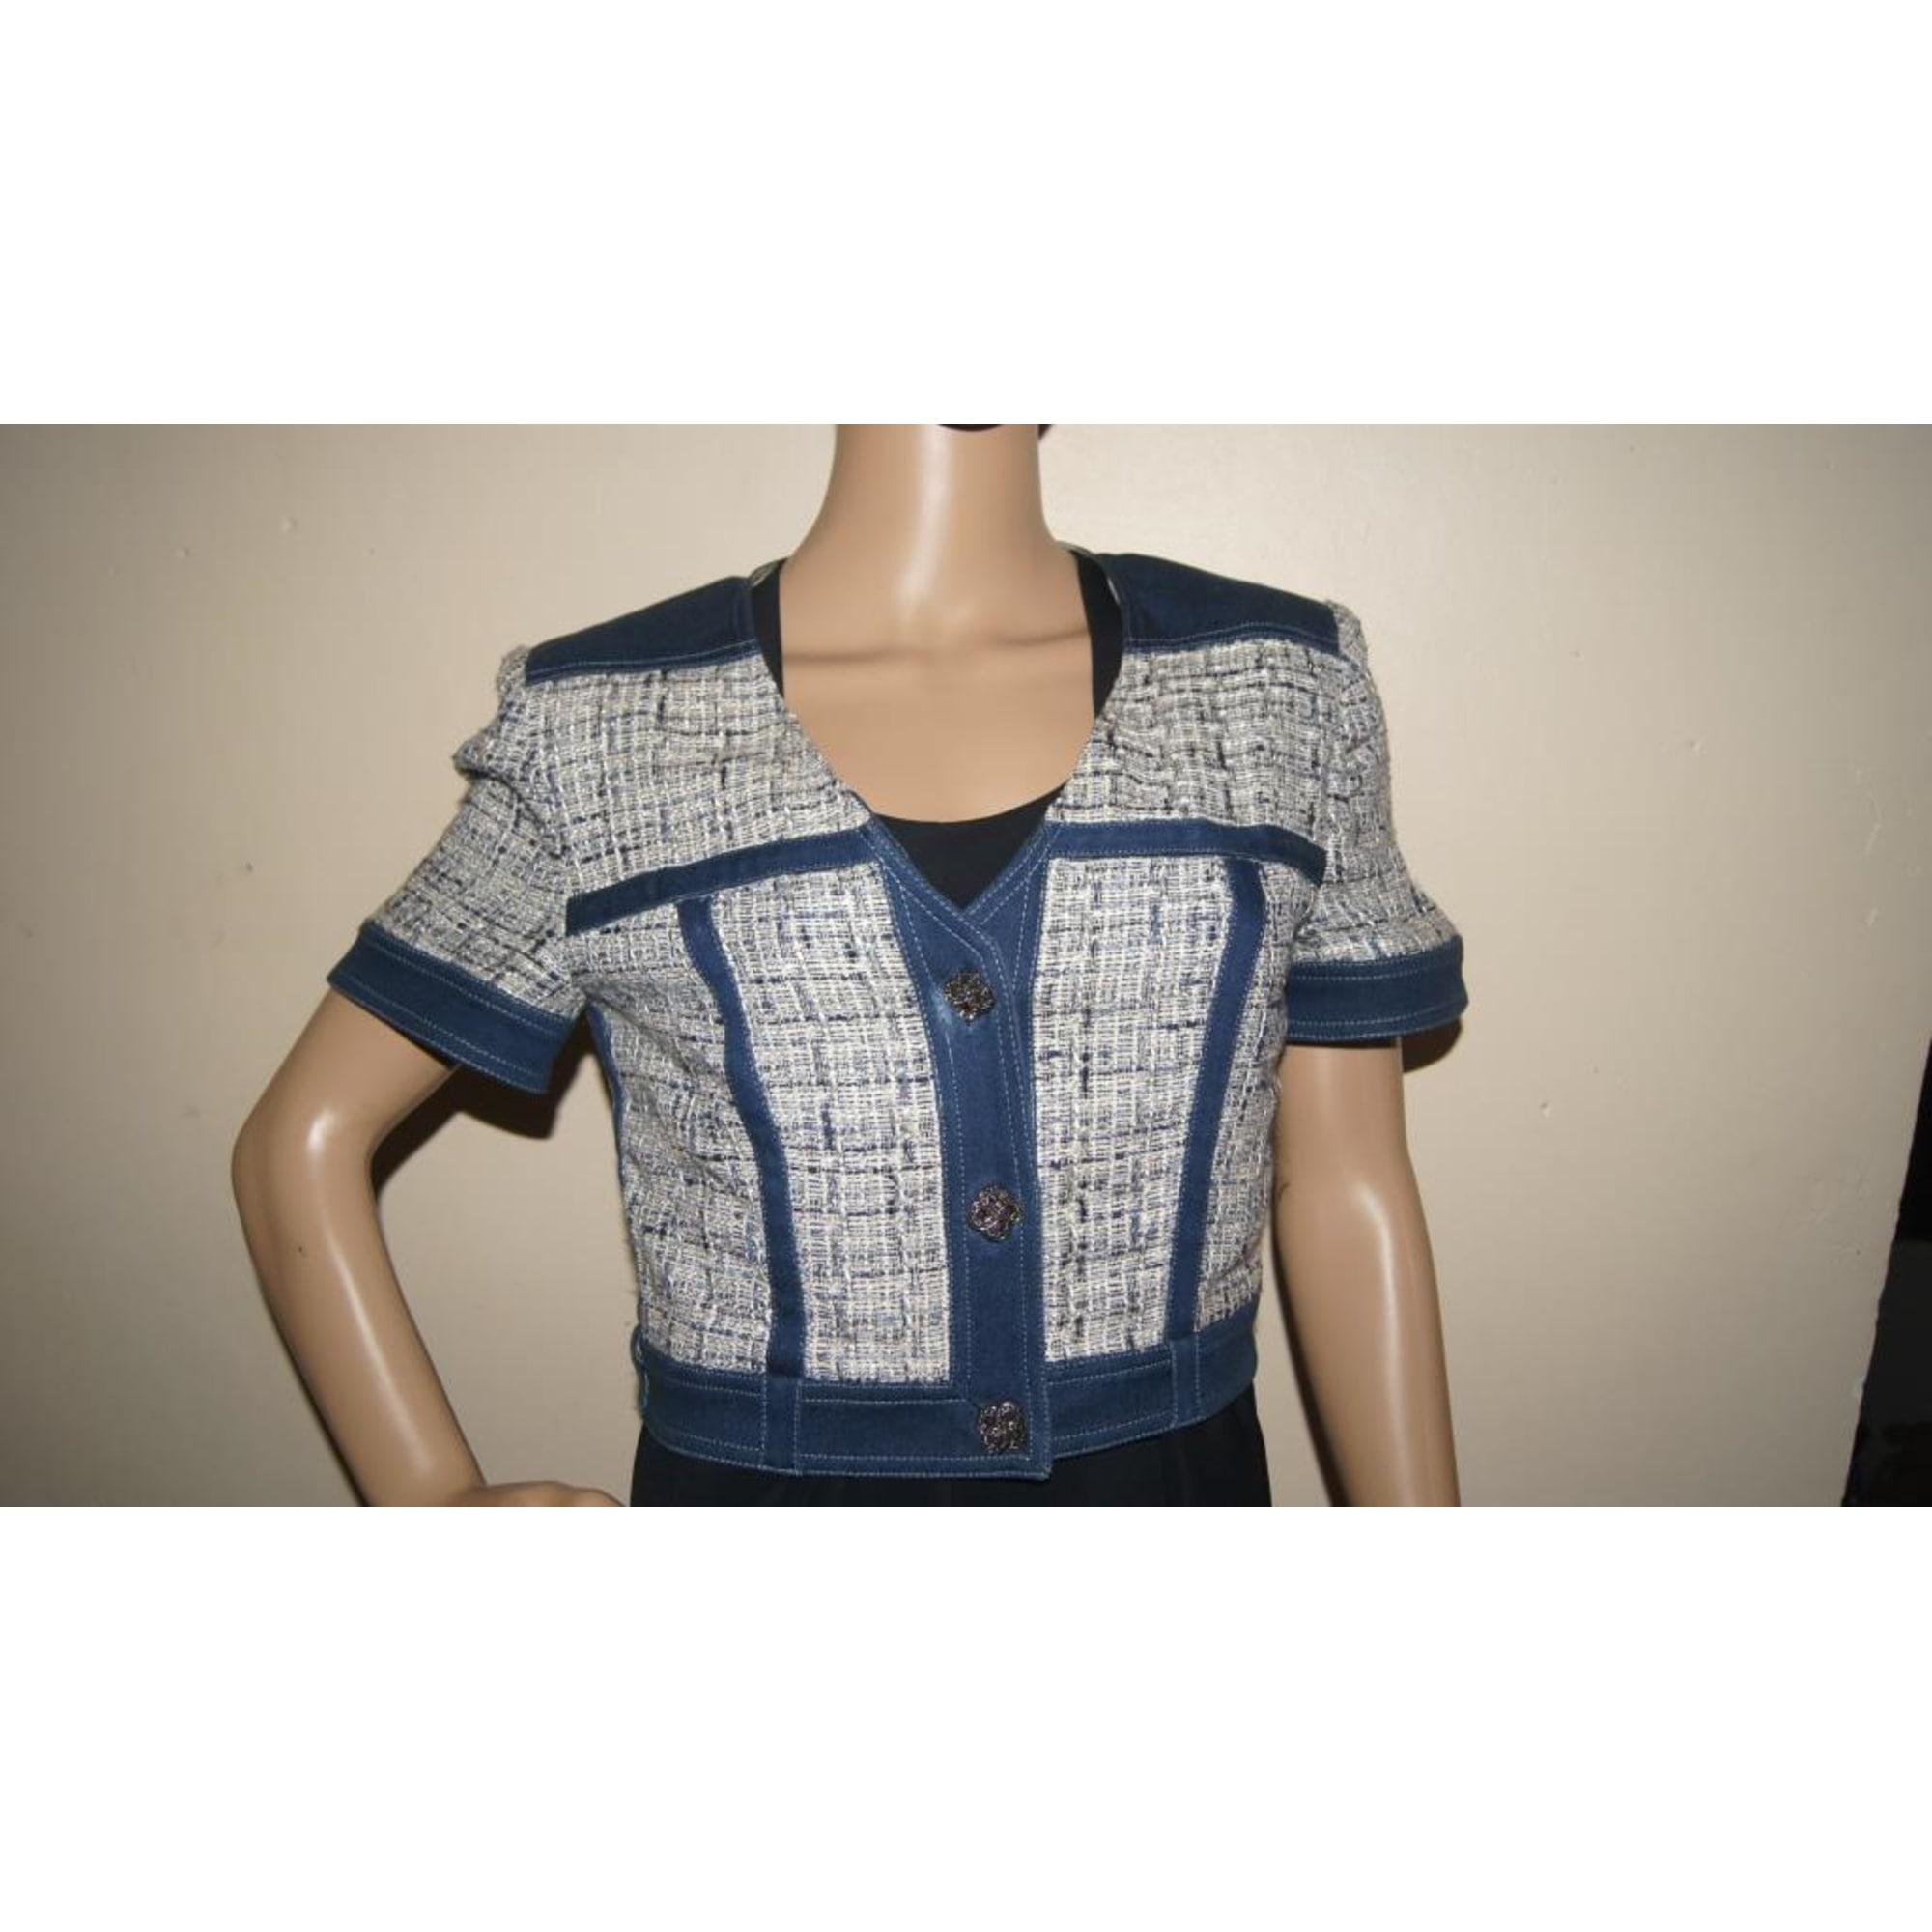 Blazer, veste tailleur JIKI MONTE CARLO Bleu, bleu marine, bleu turquoise